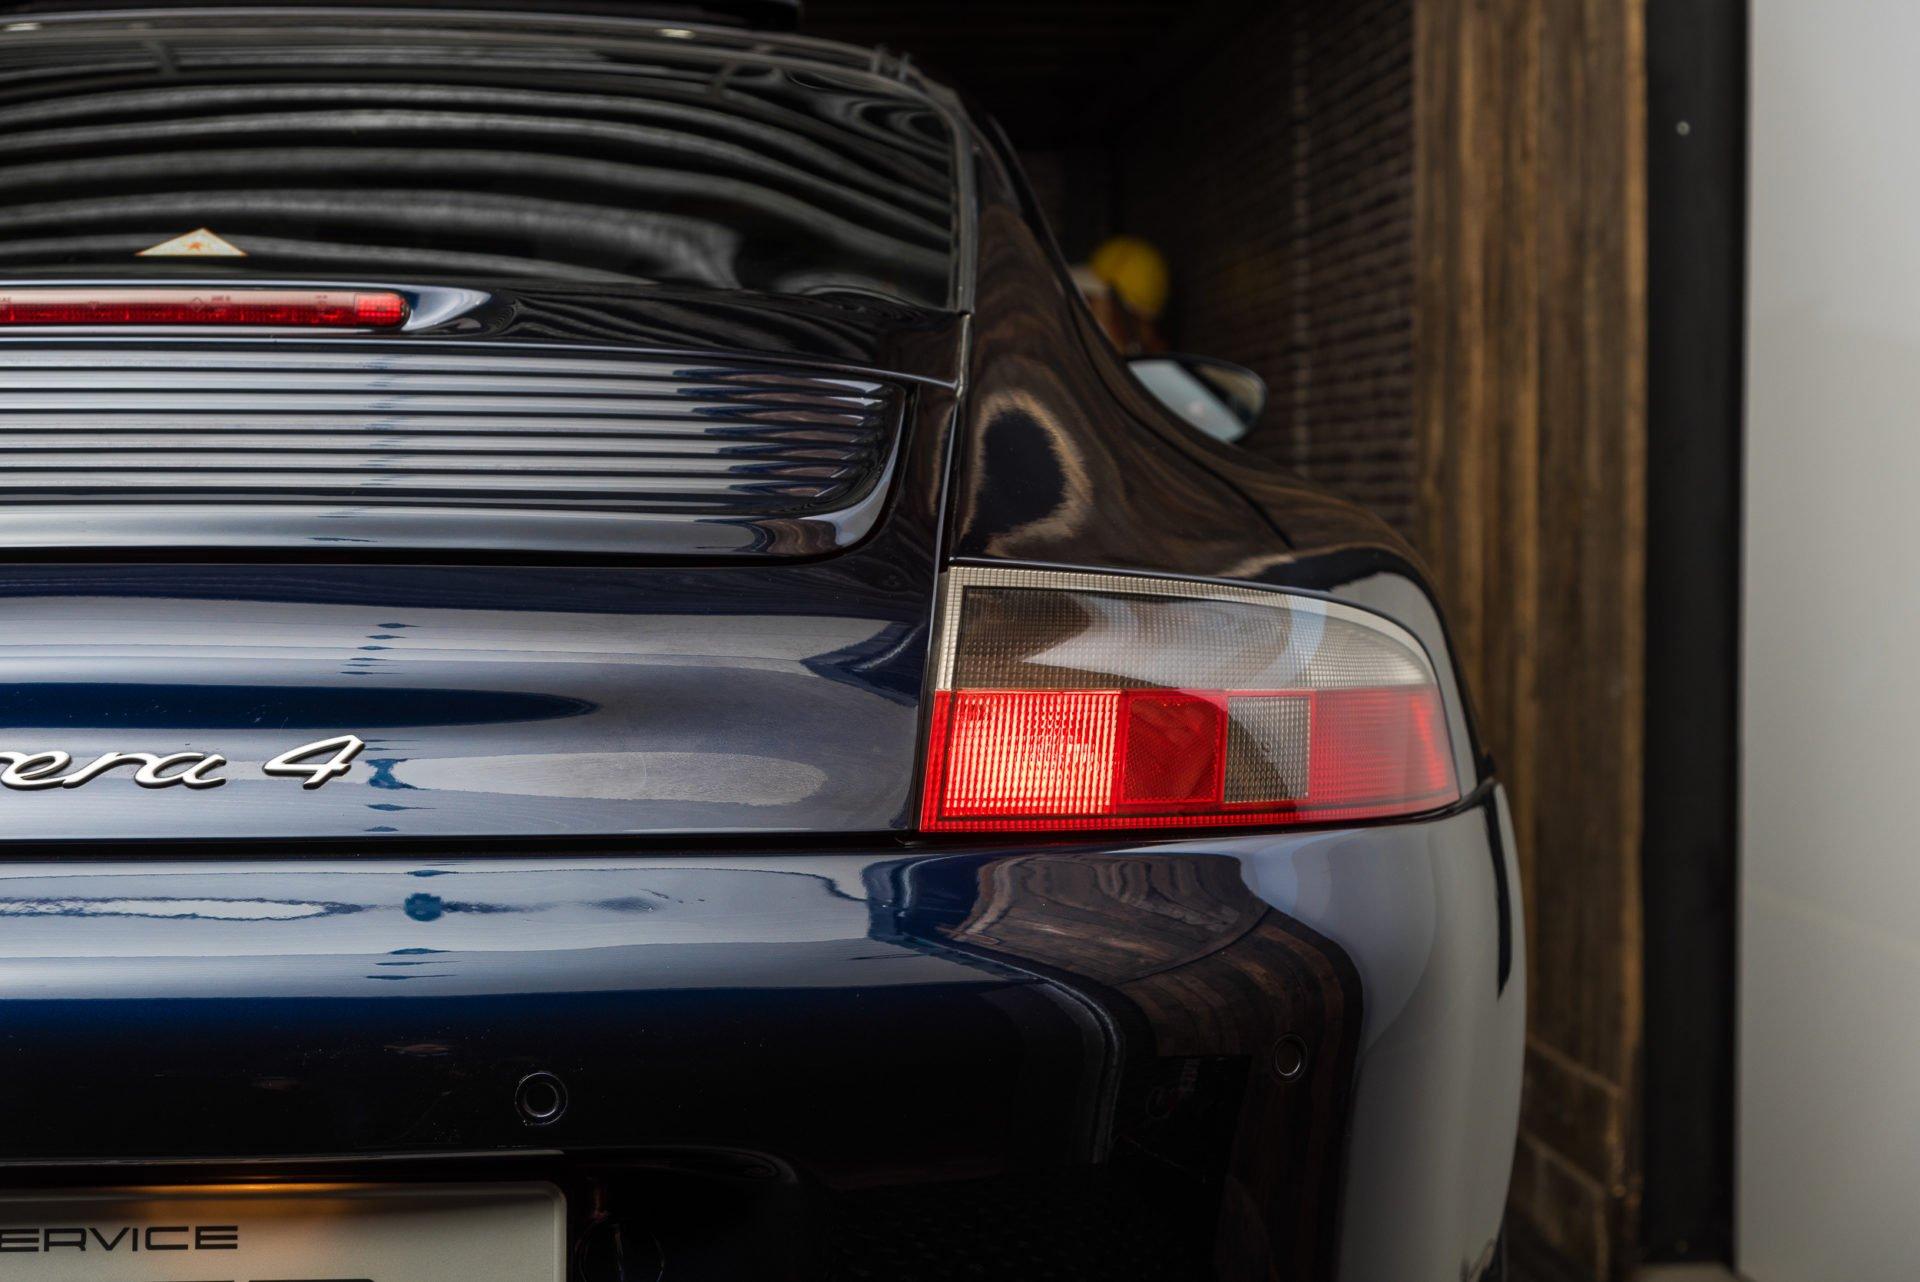 Porsche 996 Carrera 4 - 4